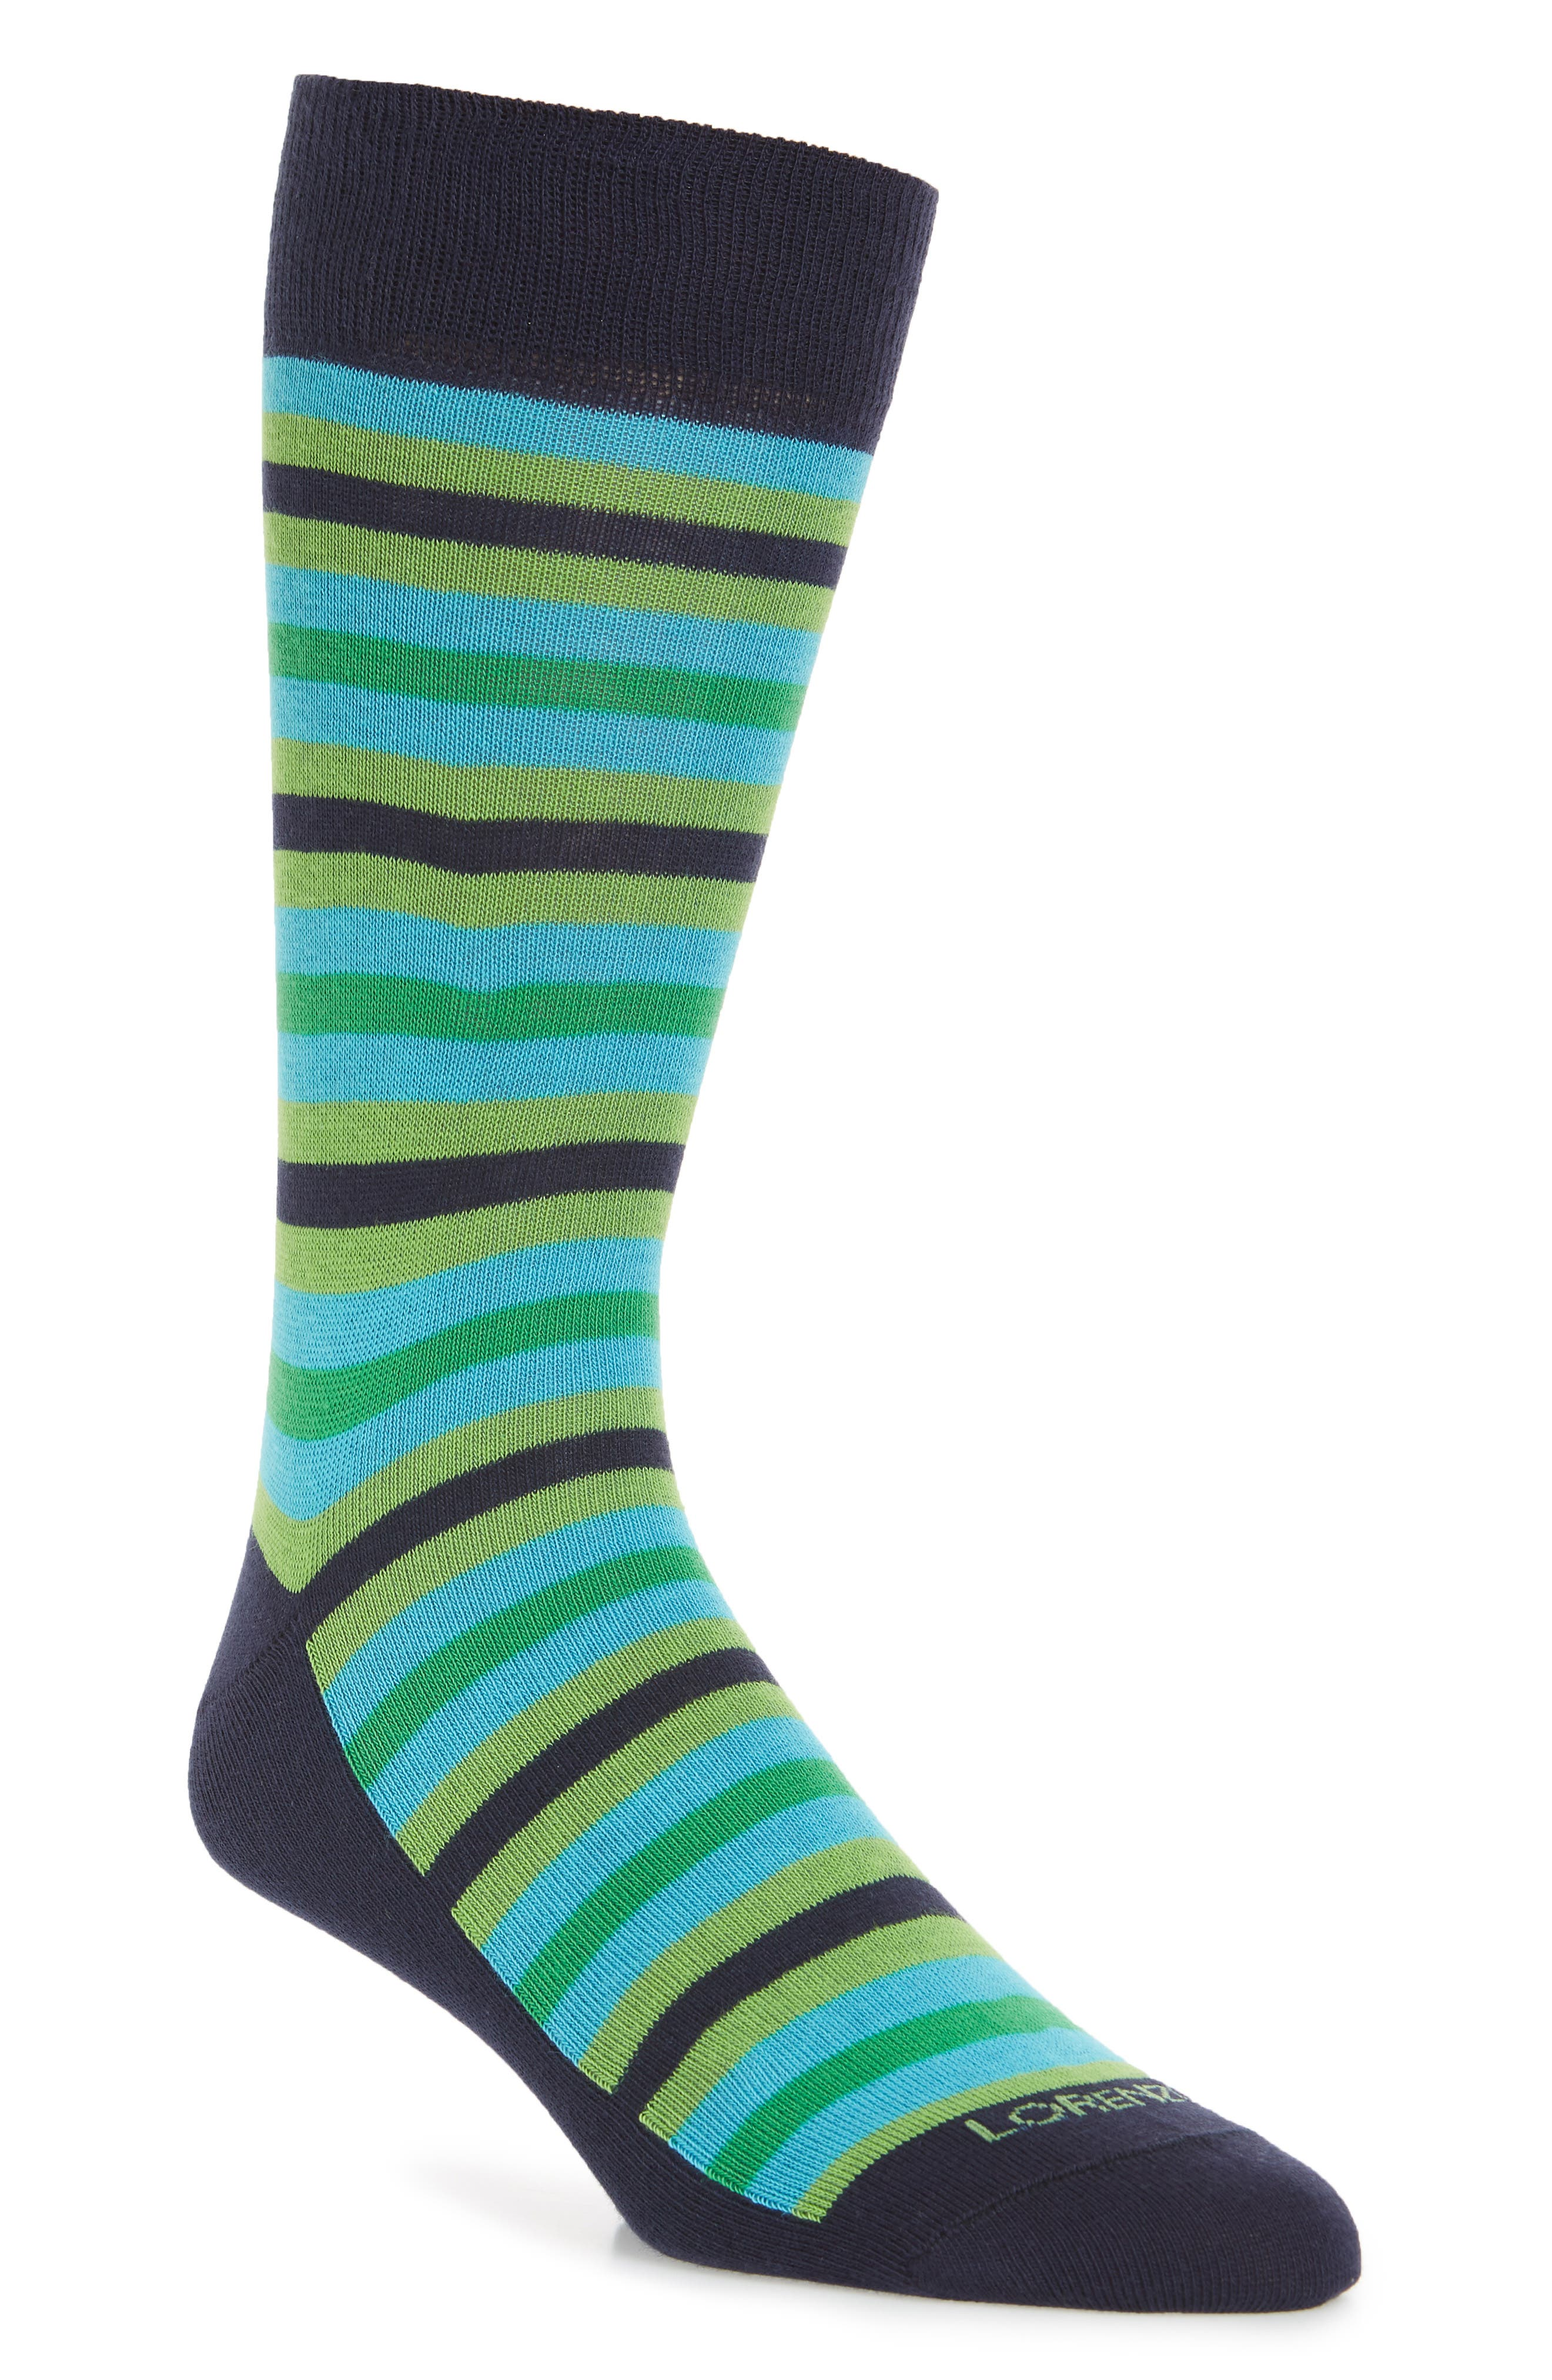 Organic Stripe Socks,                             Main thumbnail 1, color,                             NAVY